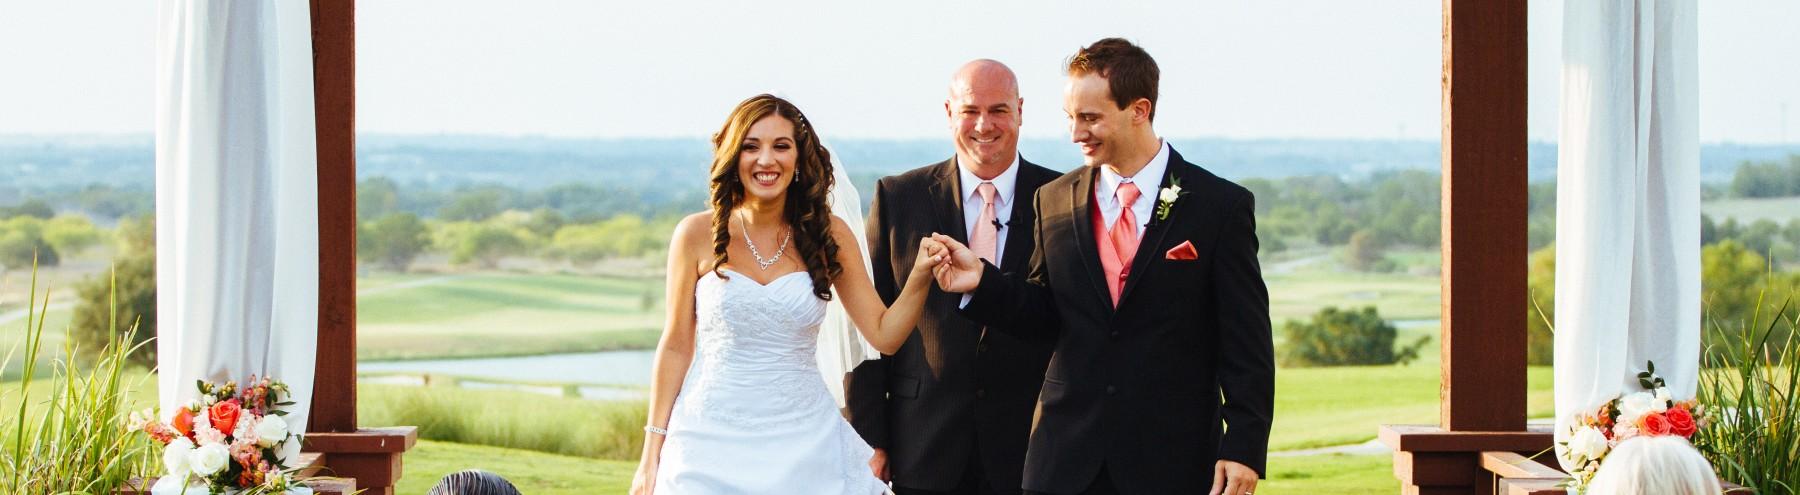 I Do Ceremonies Austin Wedding Officiant